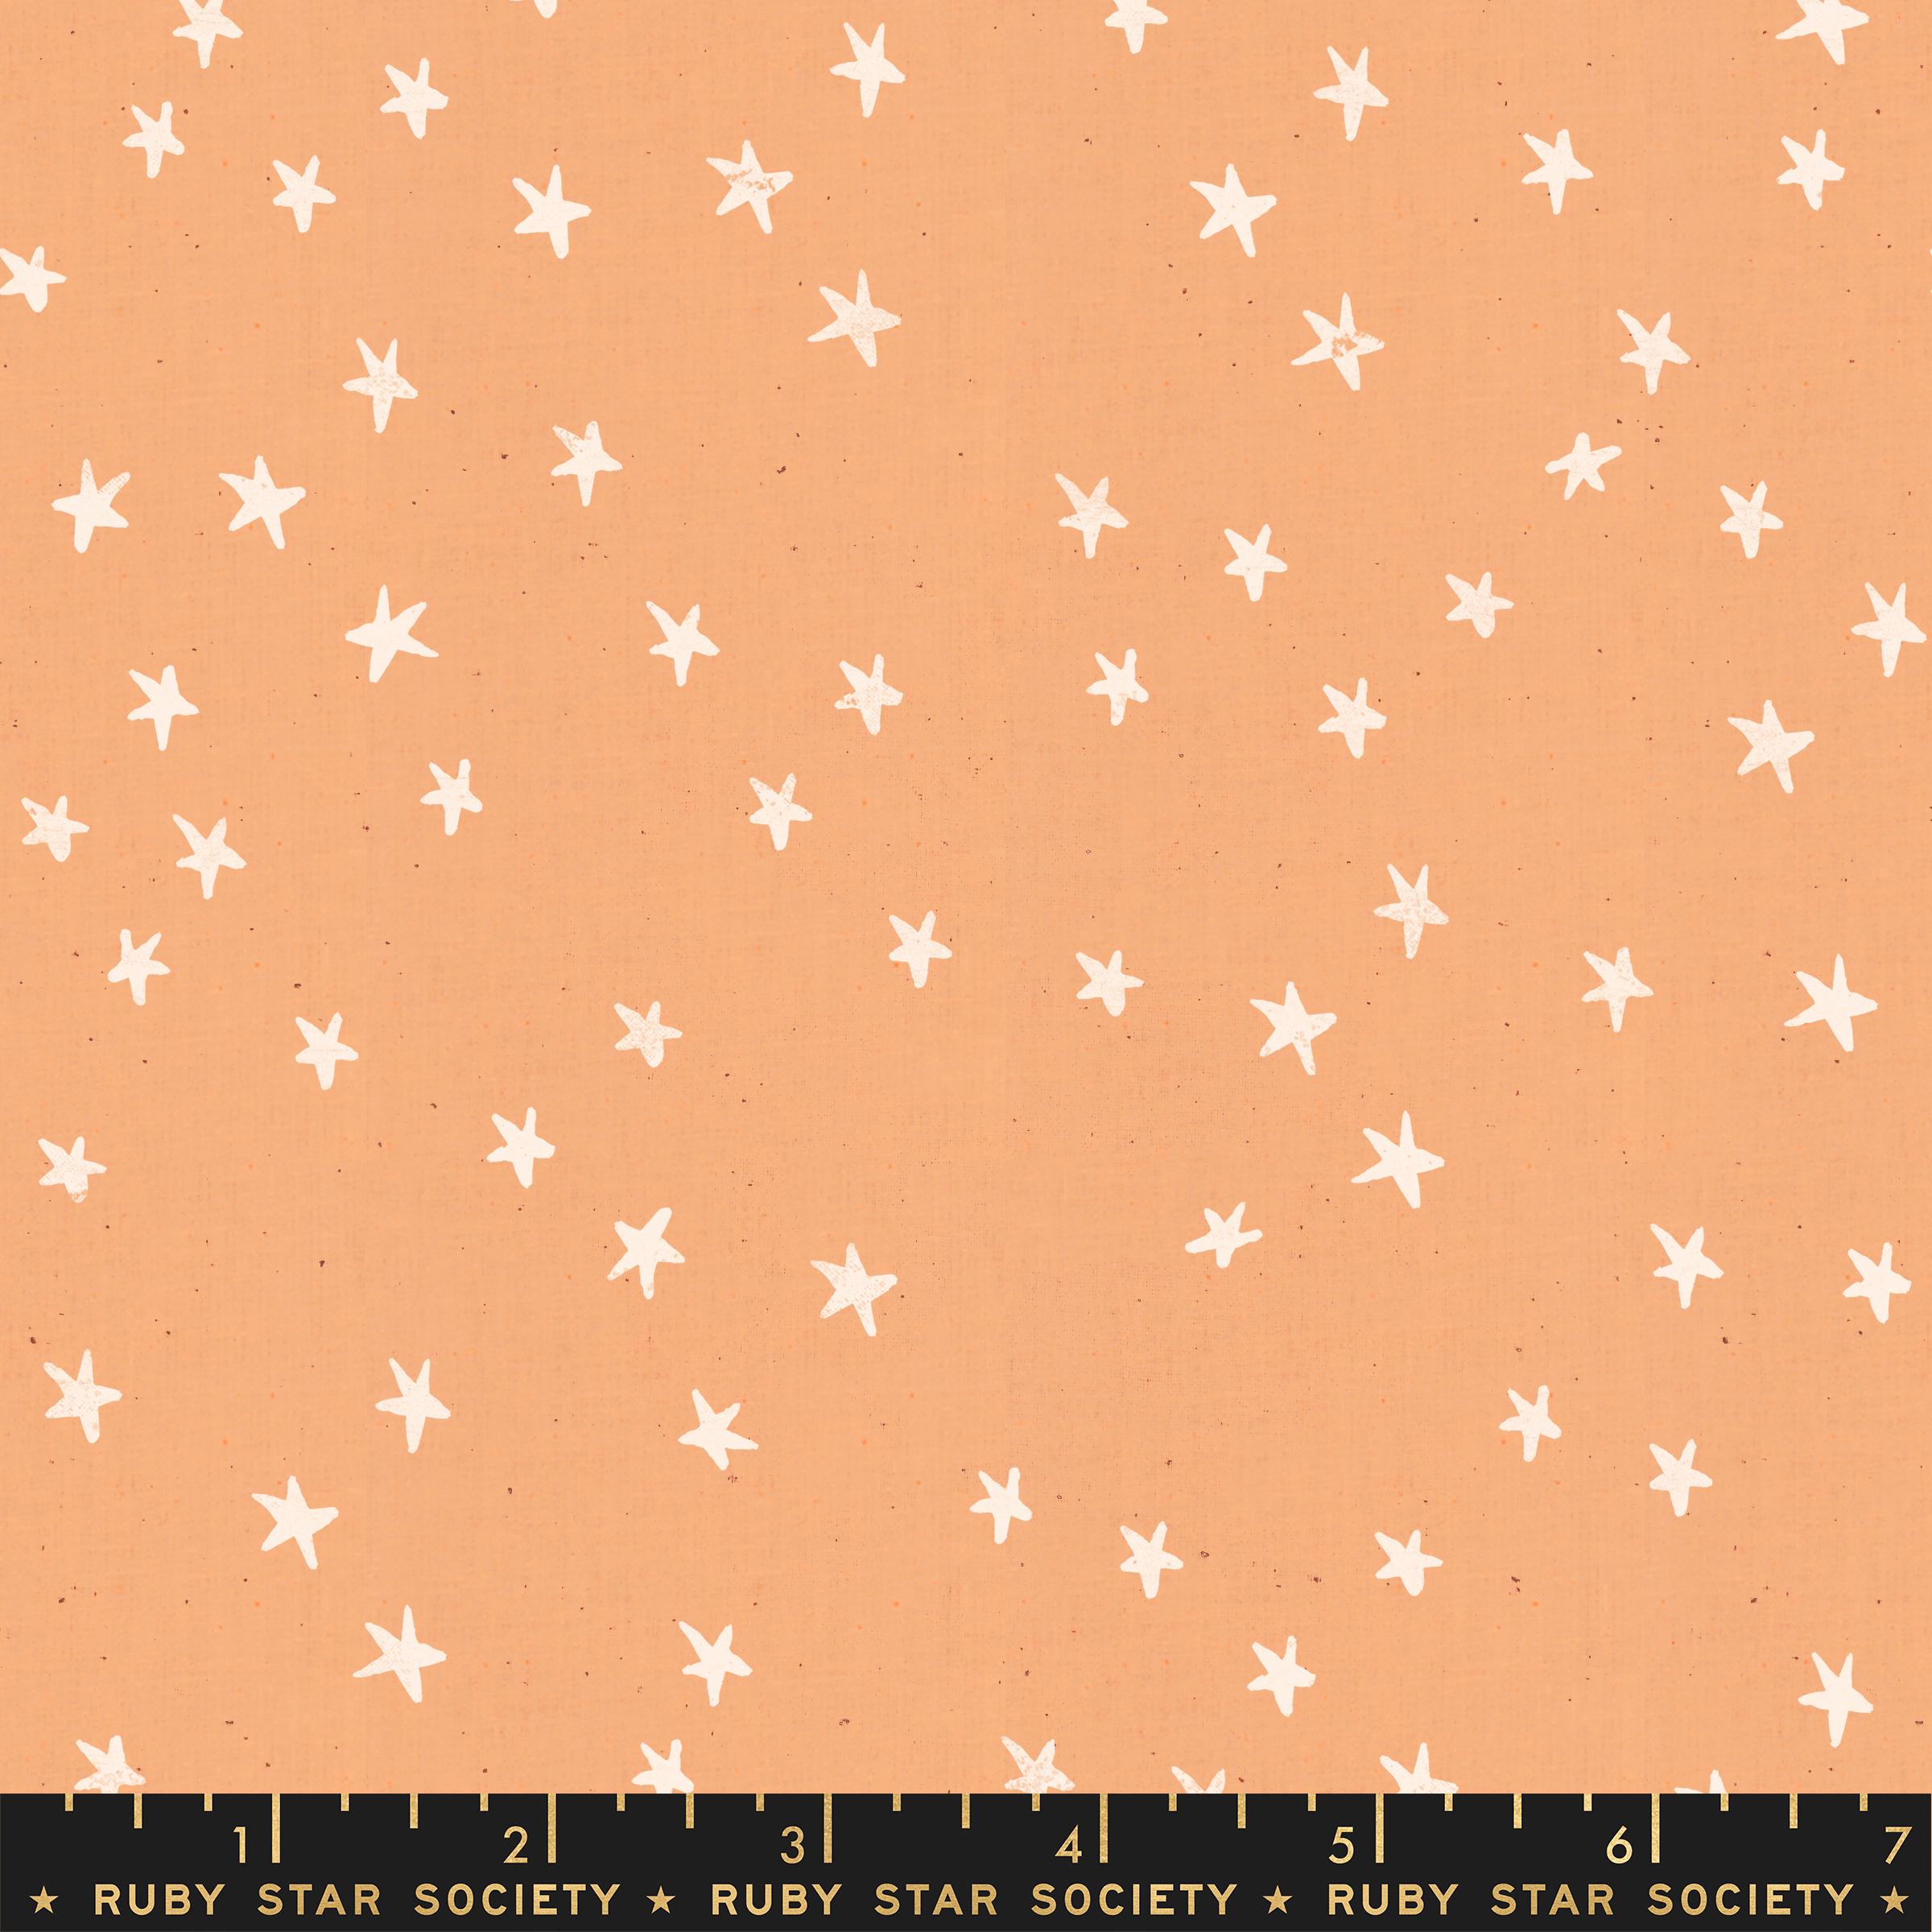 Starry - Star Night Sky - Warm Peach RS4006 17